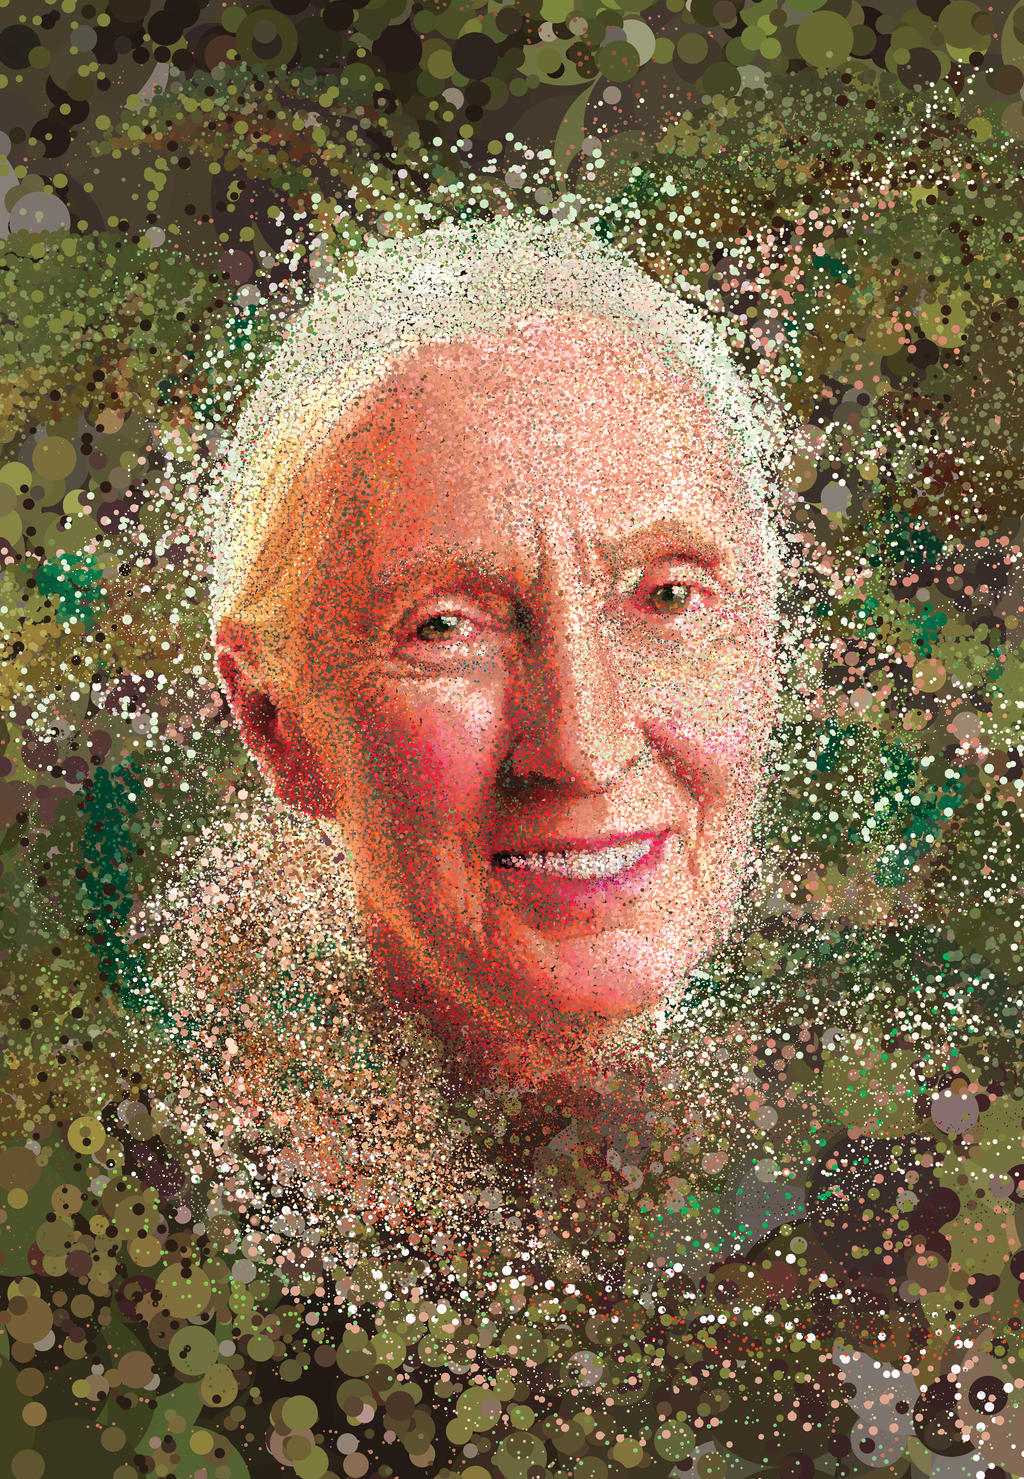 Jane Goodall by erikfoxjackson